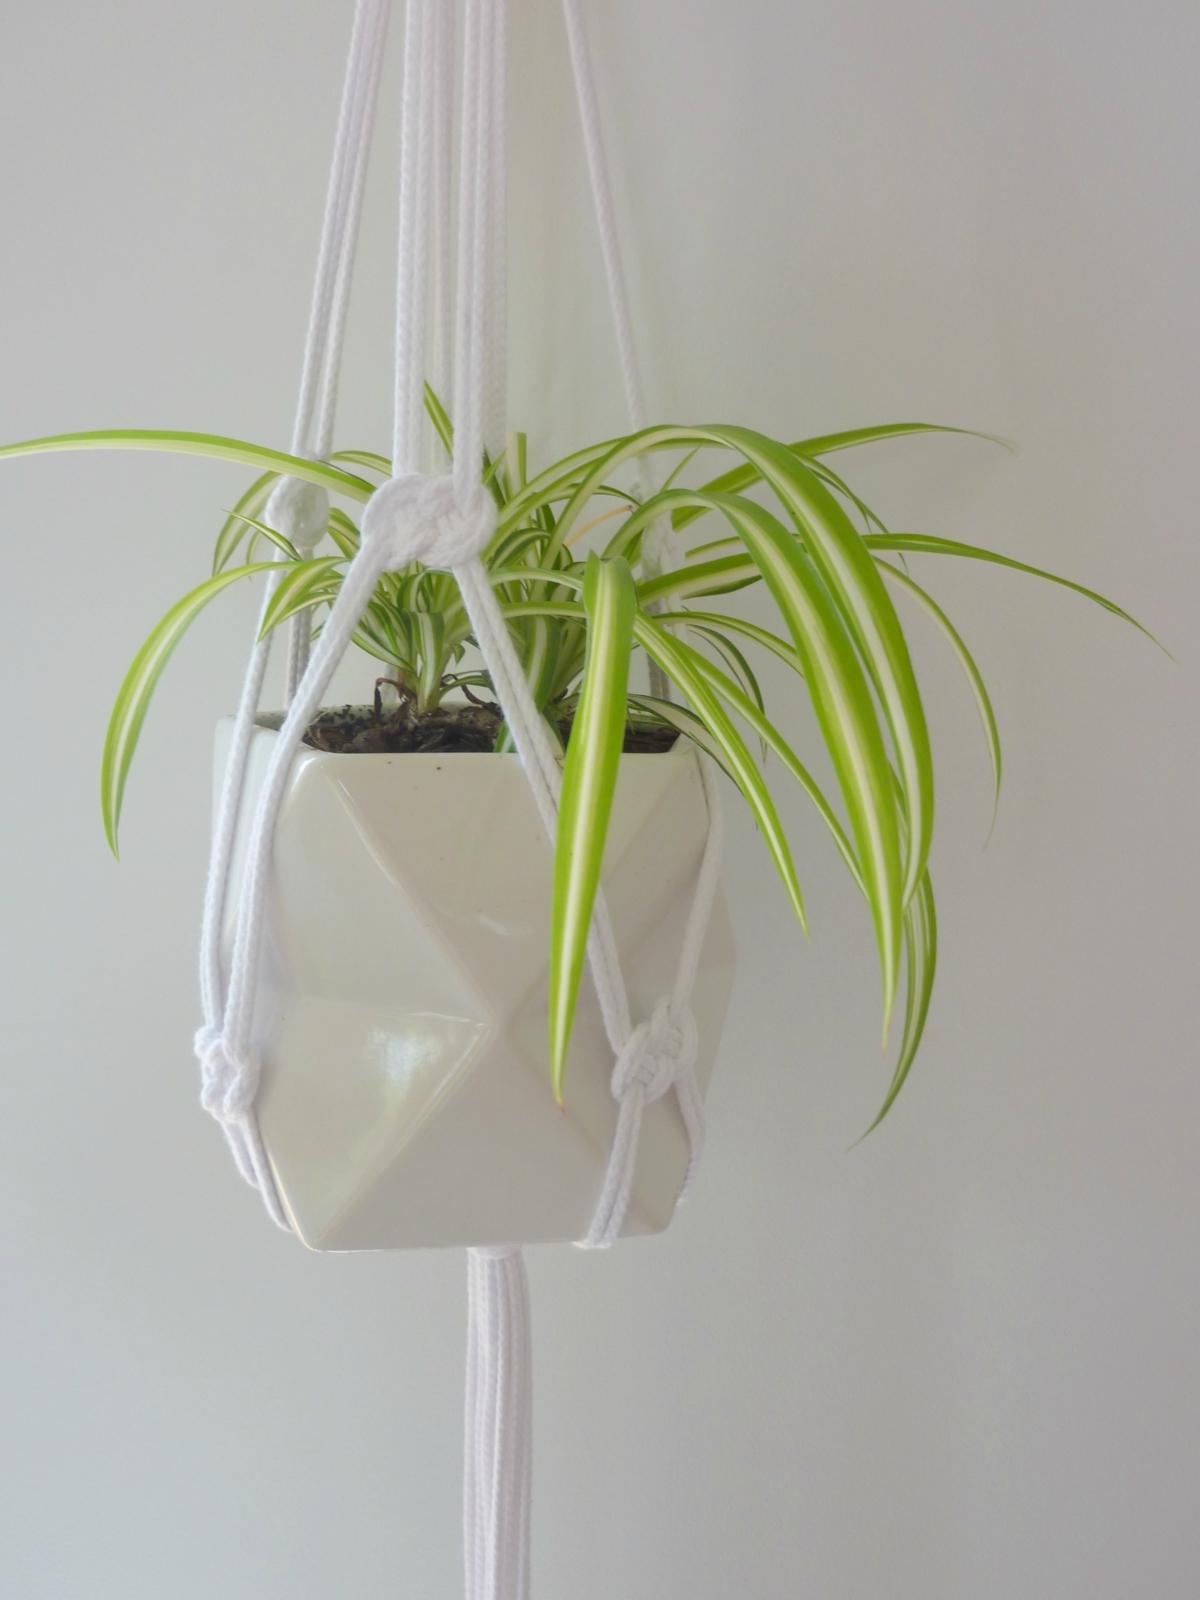 The Duo Macrame Hanging Plant Holder Felt